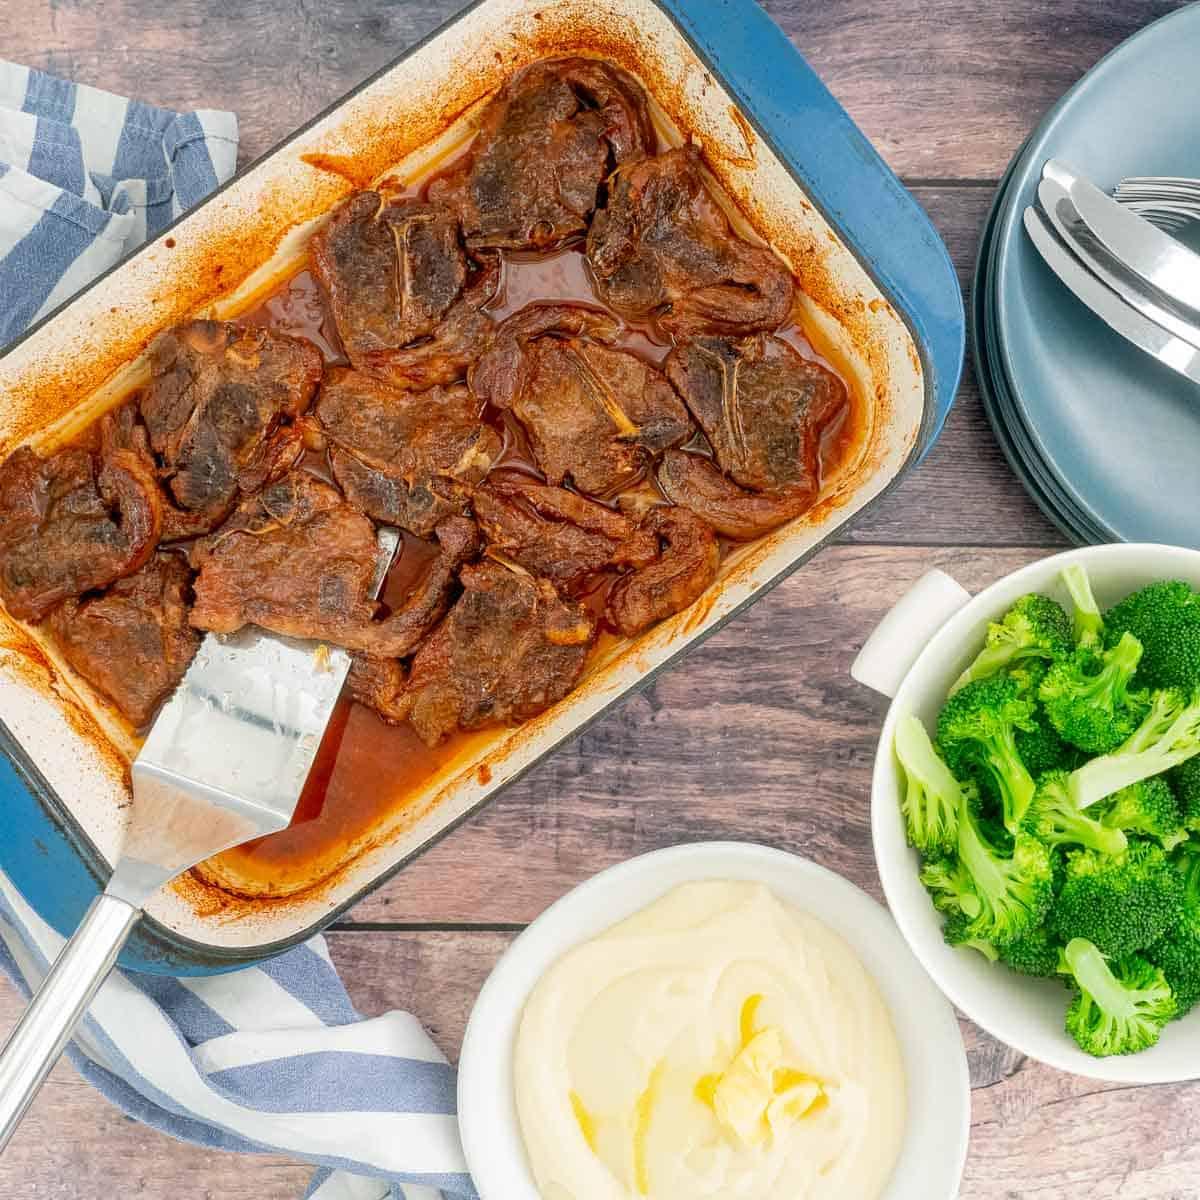 A cermic backing dish of marinaded lamb chops, alongside a bowl of mashed potato and broccoli.